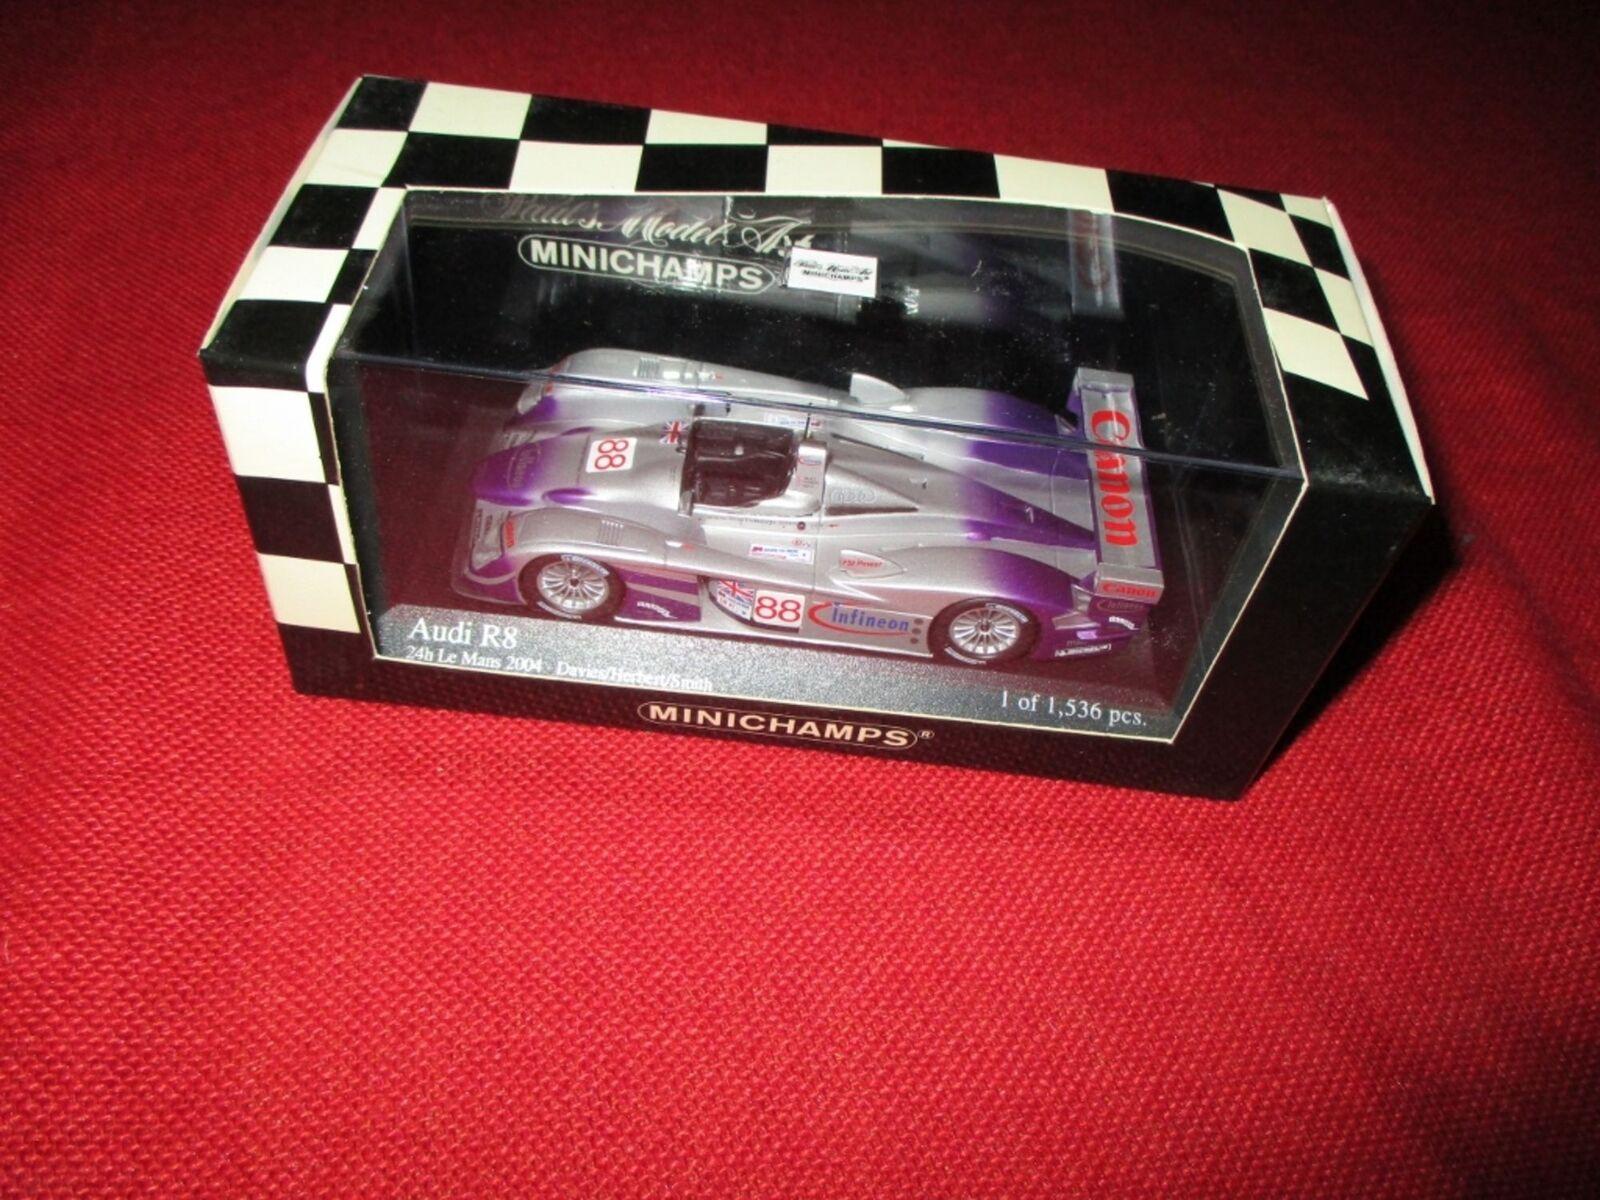 MINICHAMPS® 400 041388 1 43 Audi R8 24h Le Mans 2004 Davies Herbert Smith  | Angenehmes Gefühl